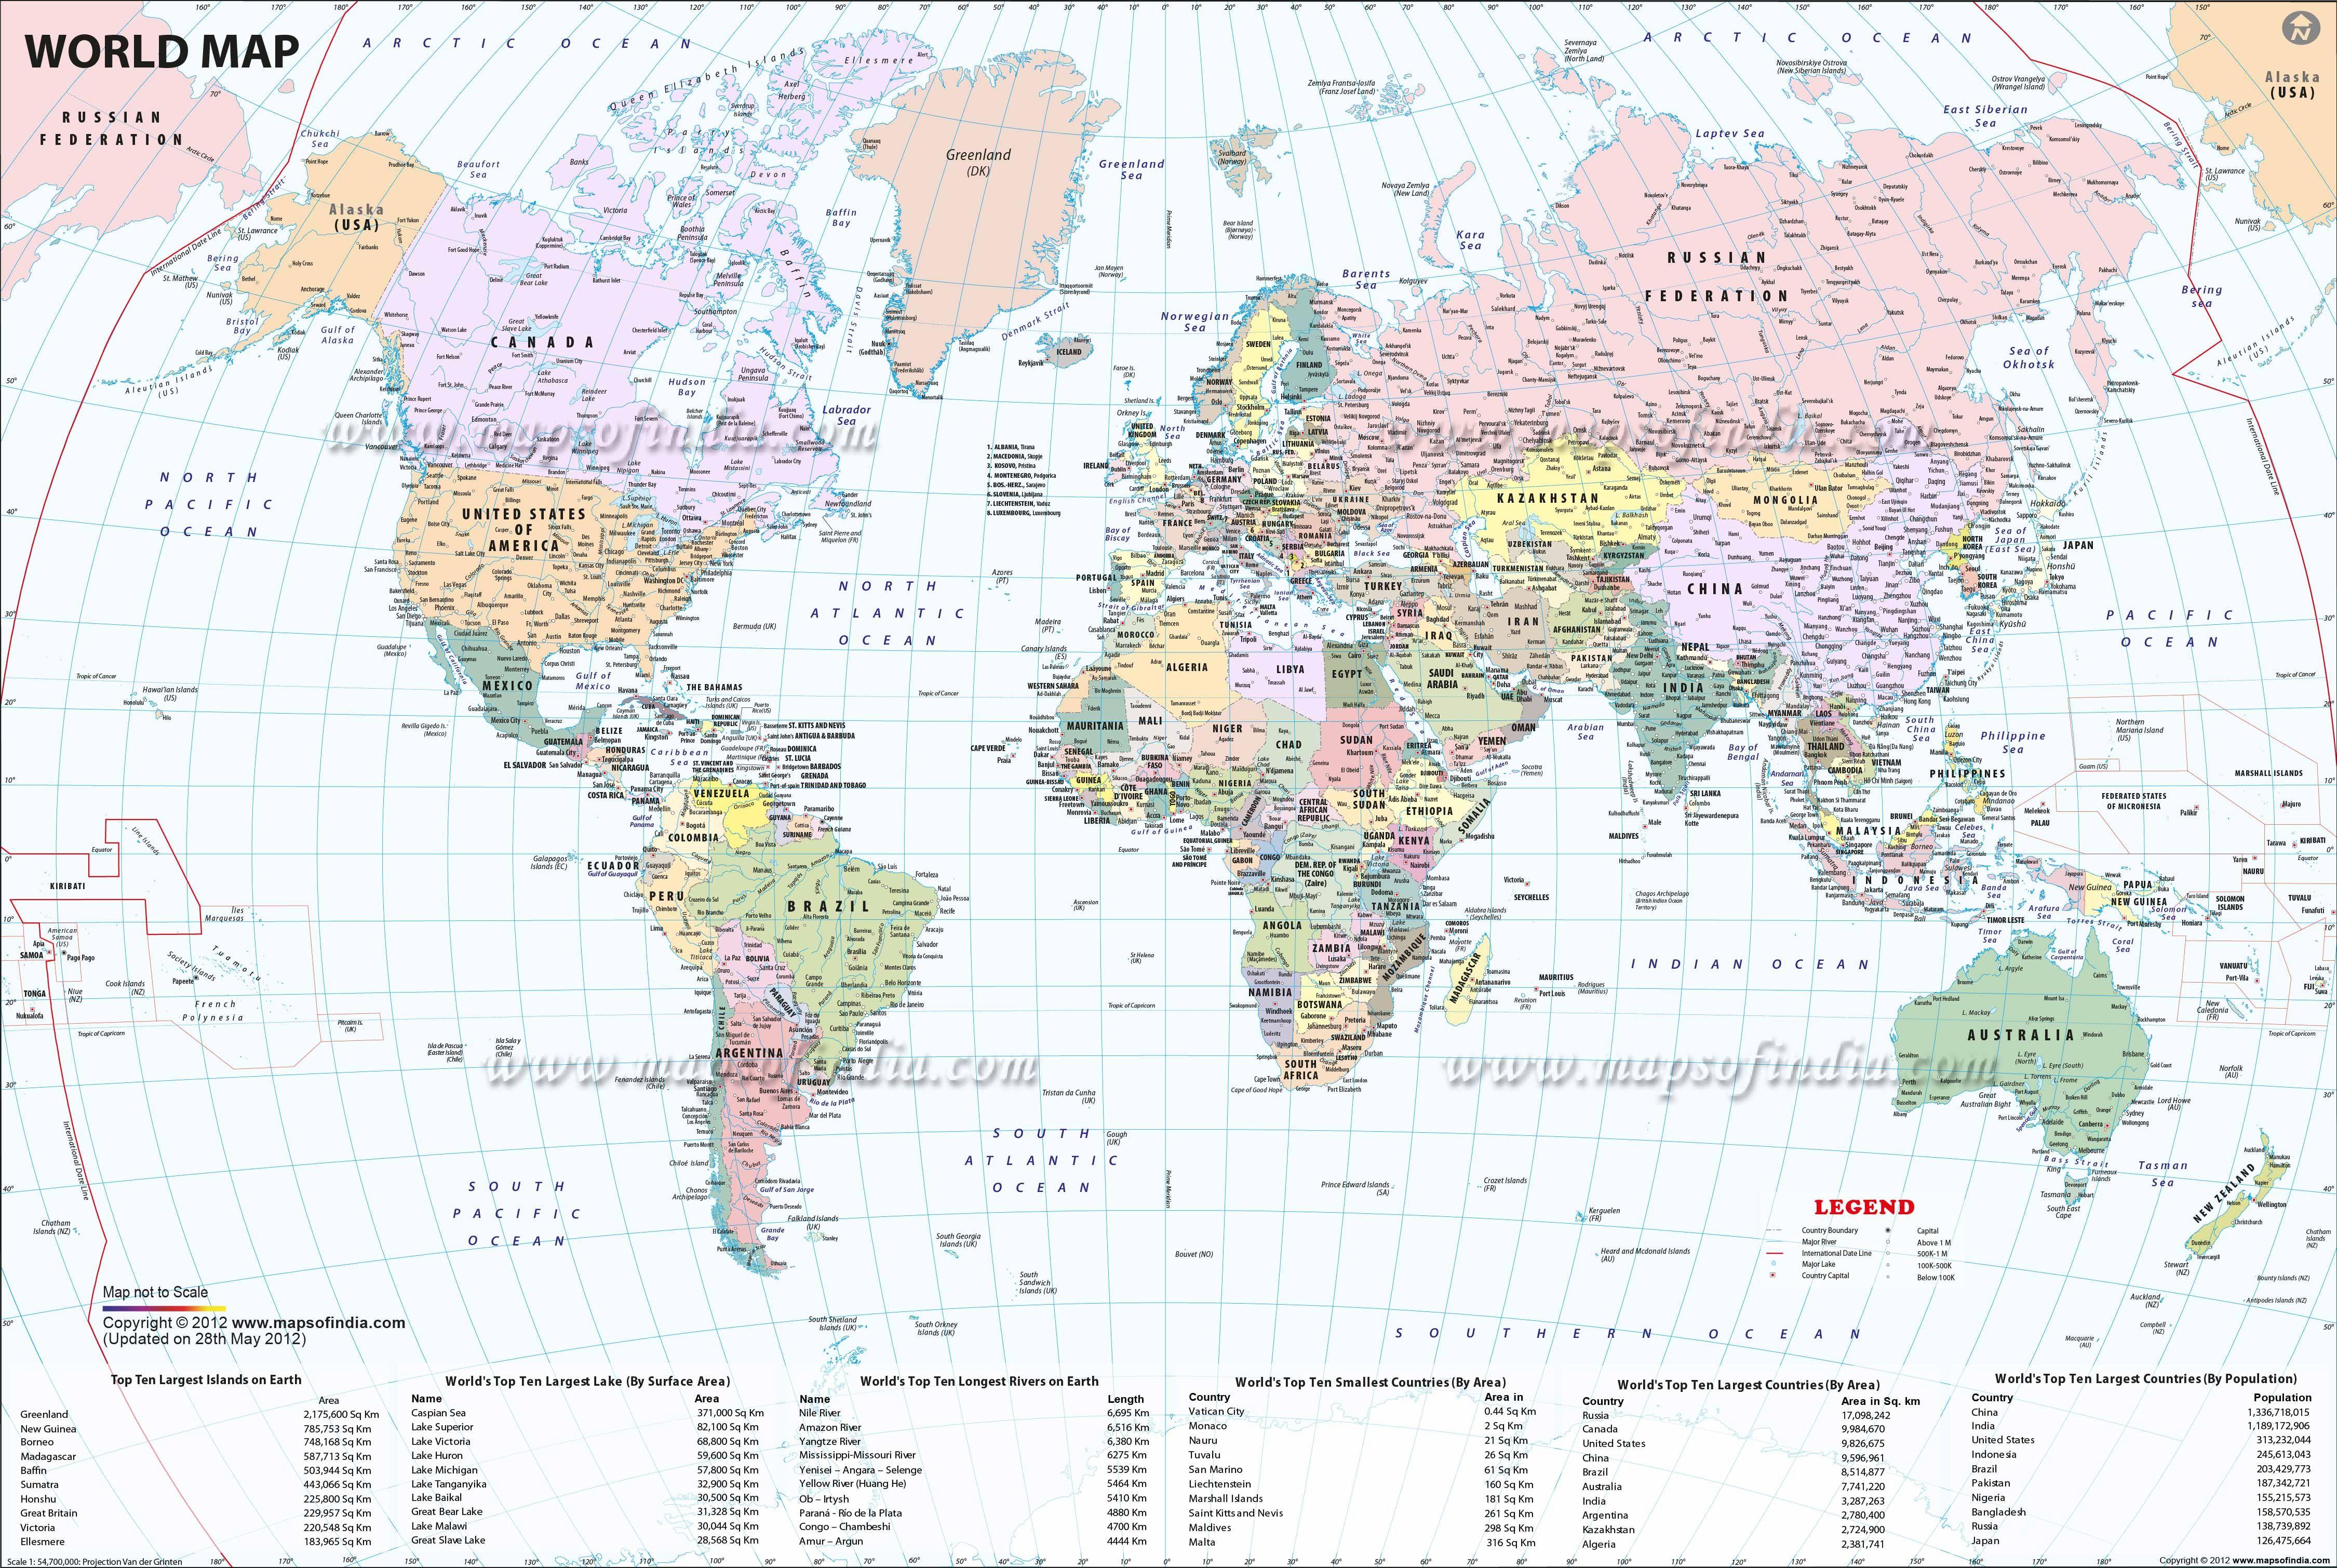 Educational sources world map education tls and aids pinterest educational sources world map gumiabroncs Images